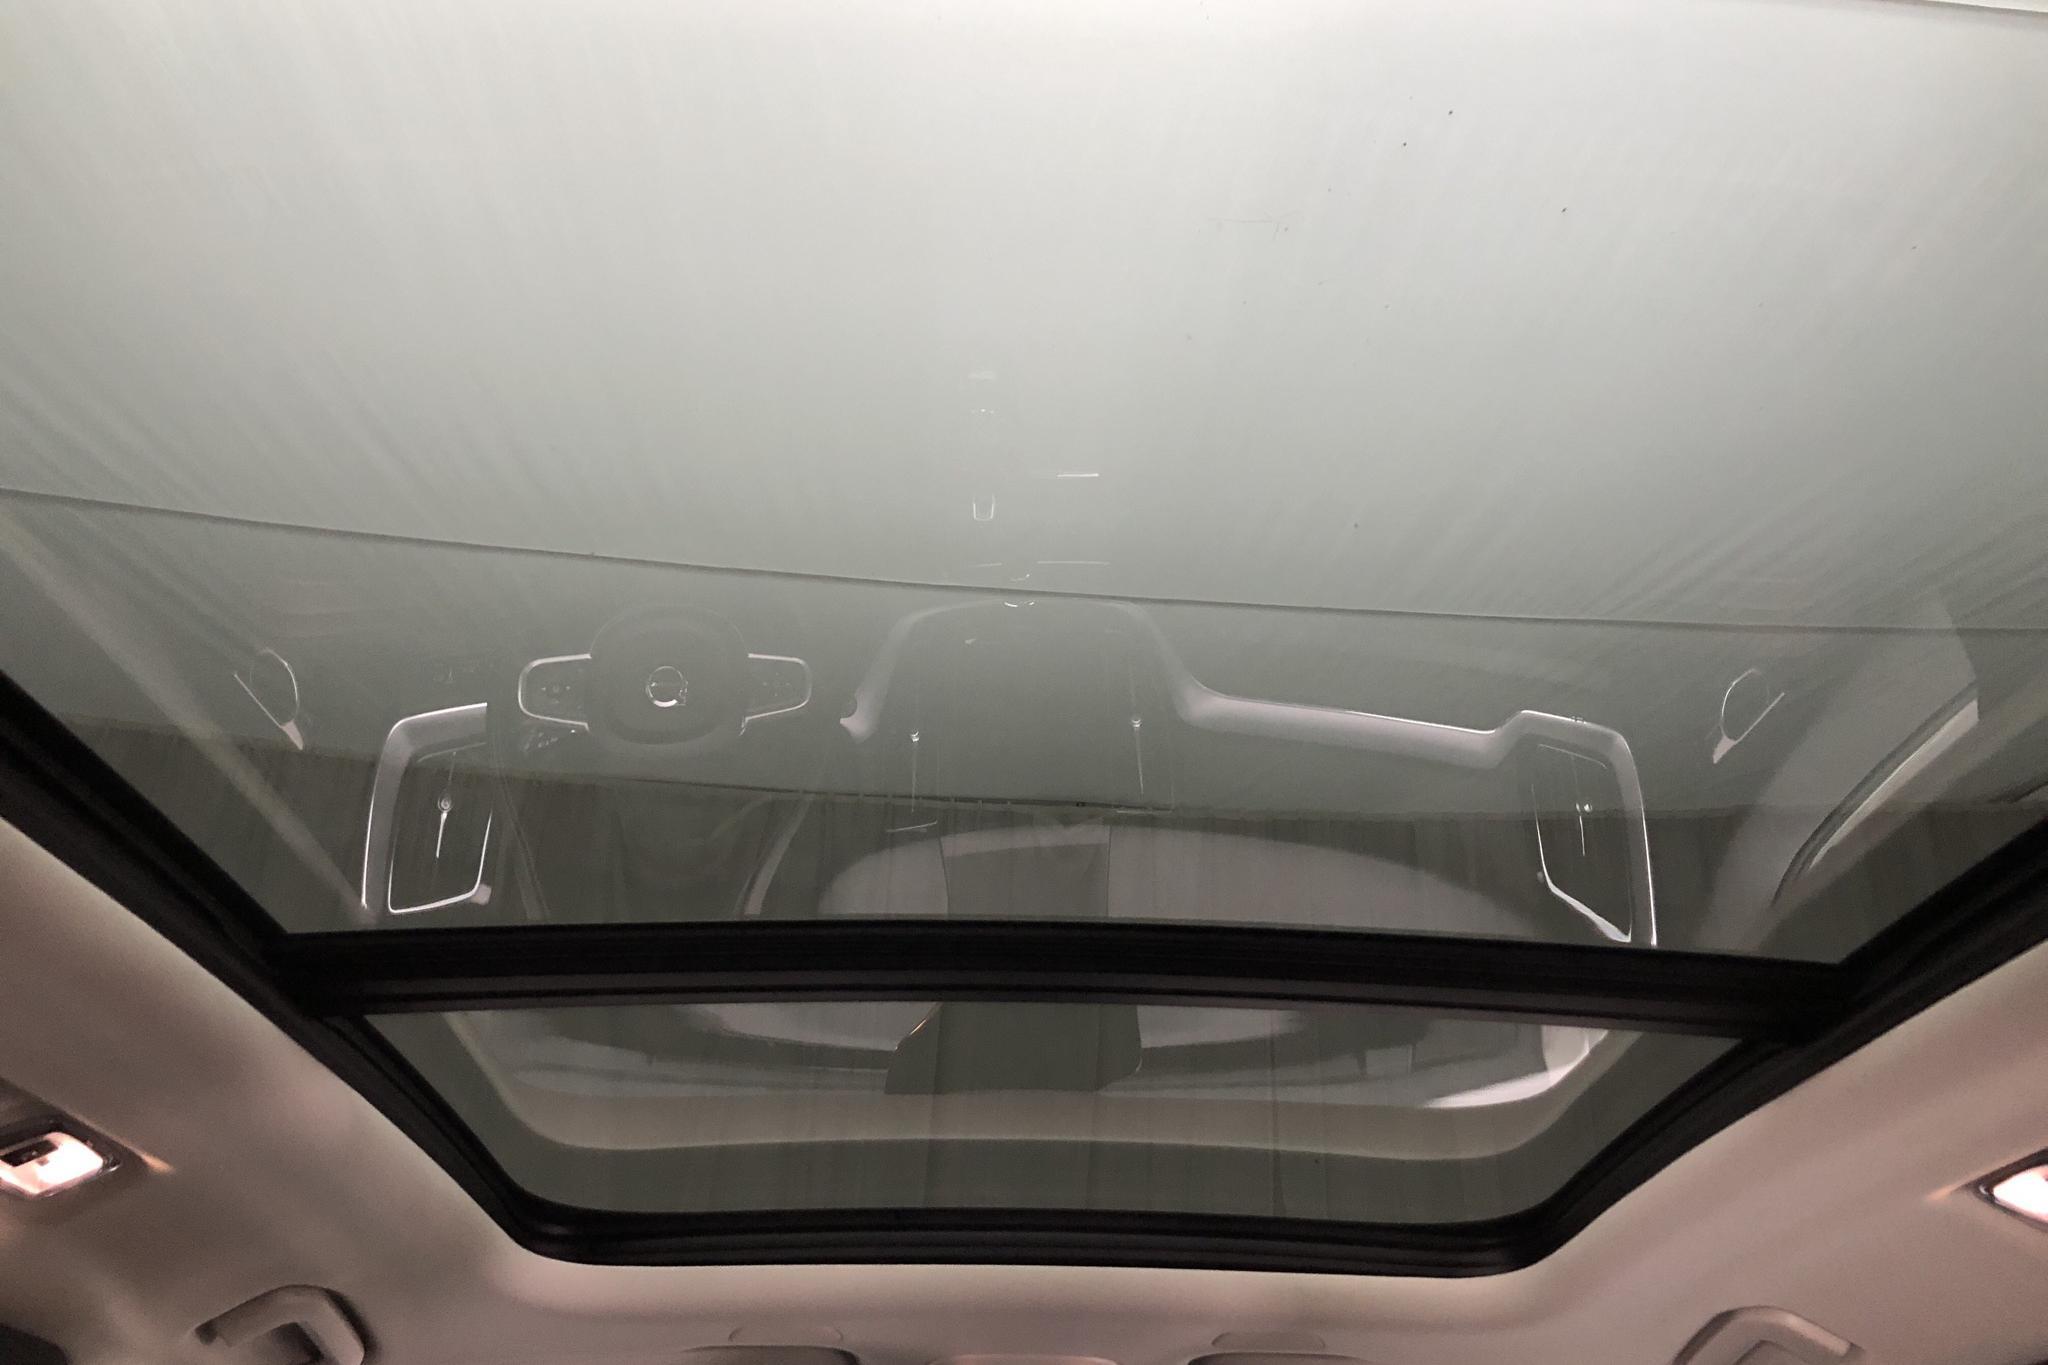 Volvo XC60 T8 AWD Twin Engine (390hk) - 43 680 km - Automatic - white - 2019